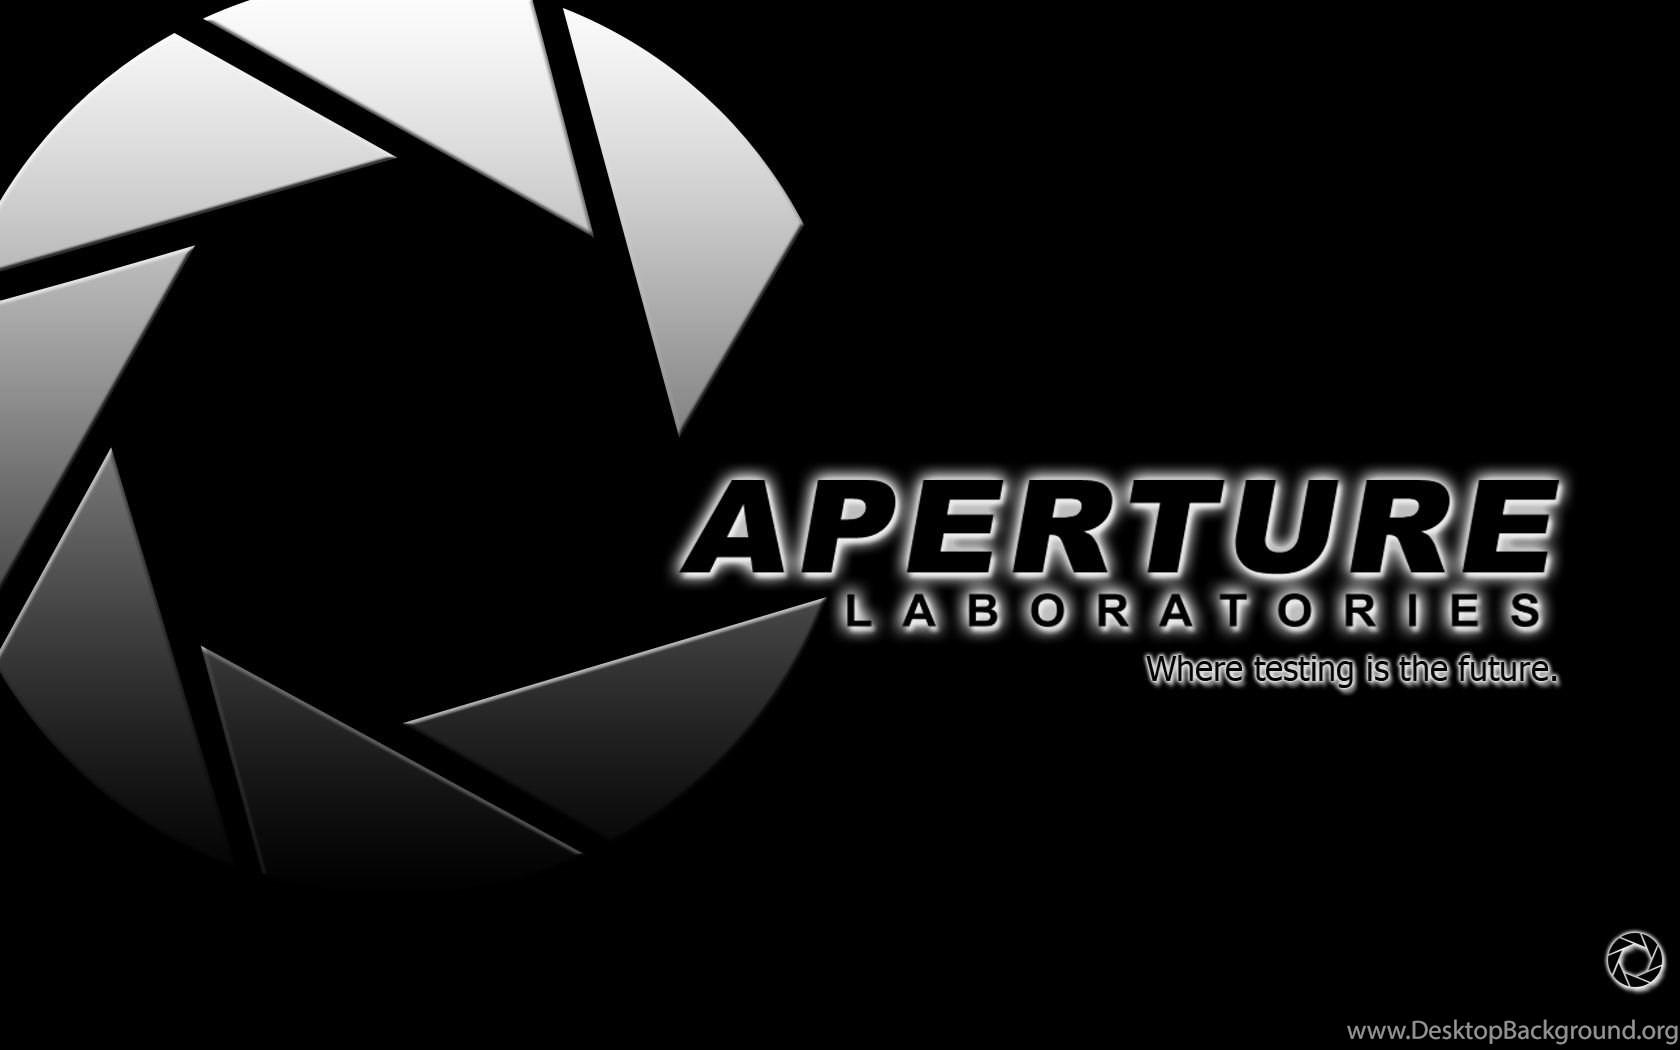 aperture science backgrounds wallpapers cave desktop background